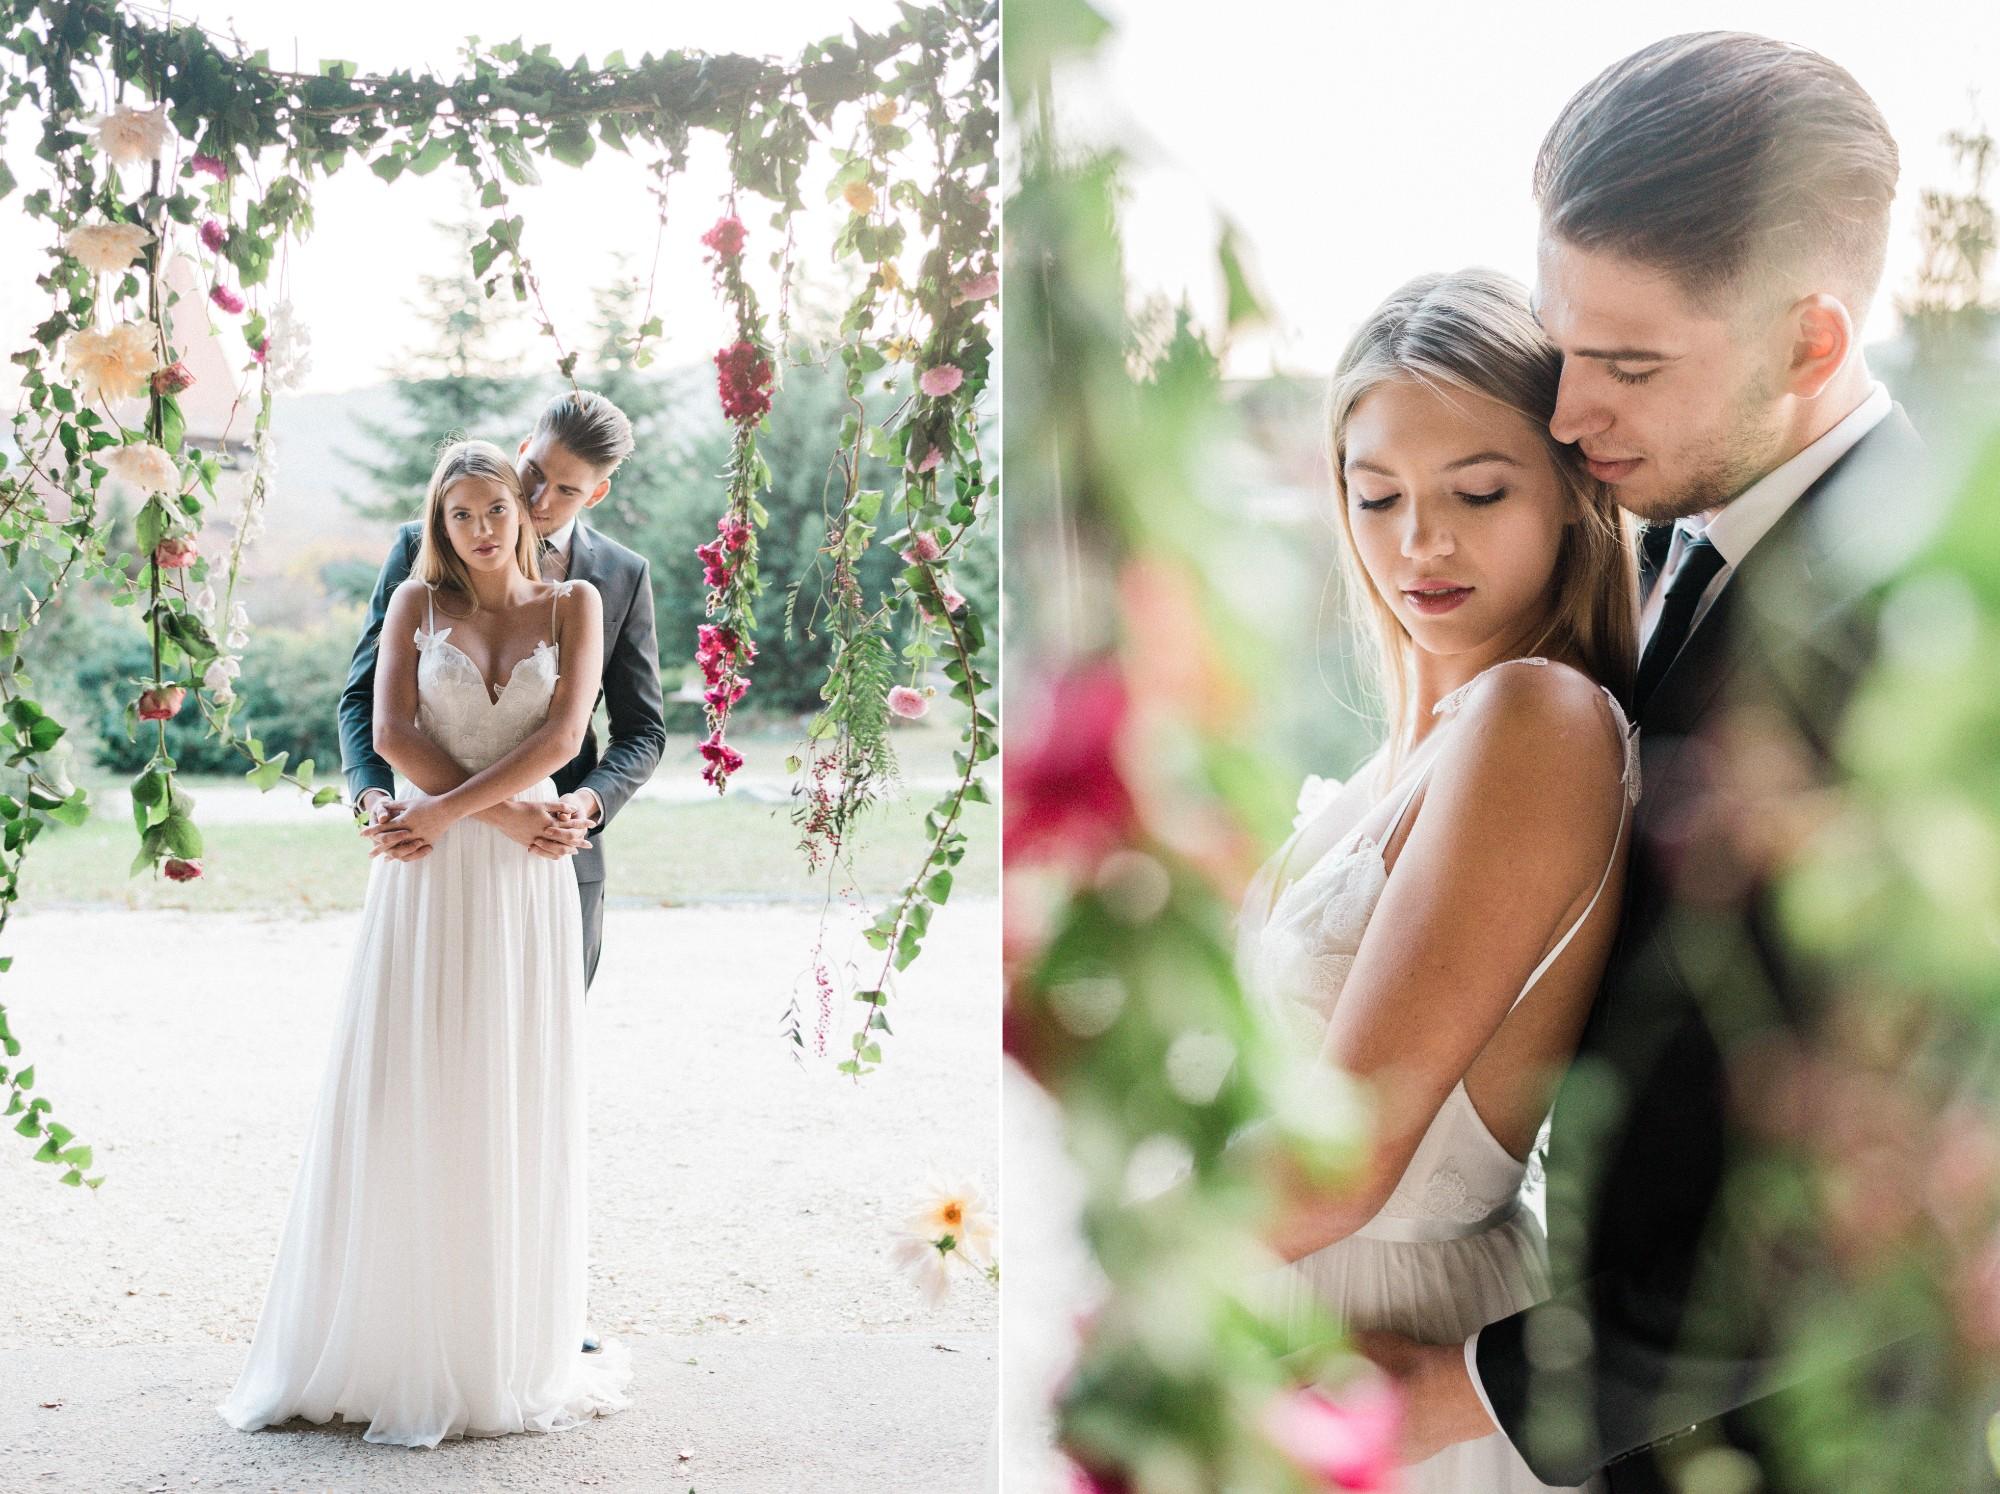 eskuvo boldogsagkapu viragok szertartashelyszin elovirag vagott virag kulonleges natural wedding decor.jpg